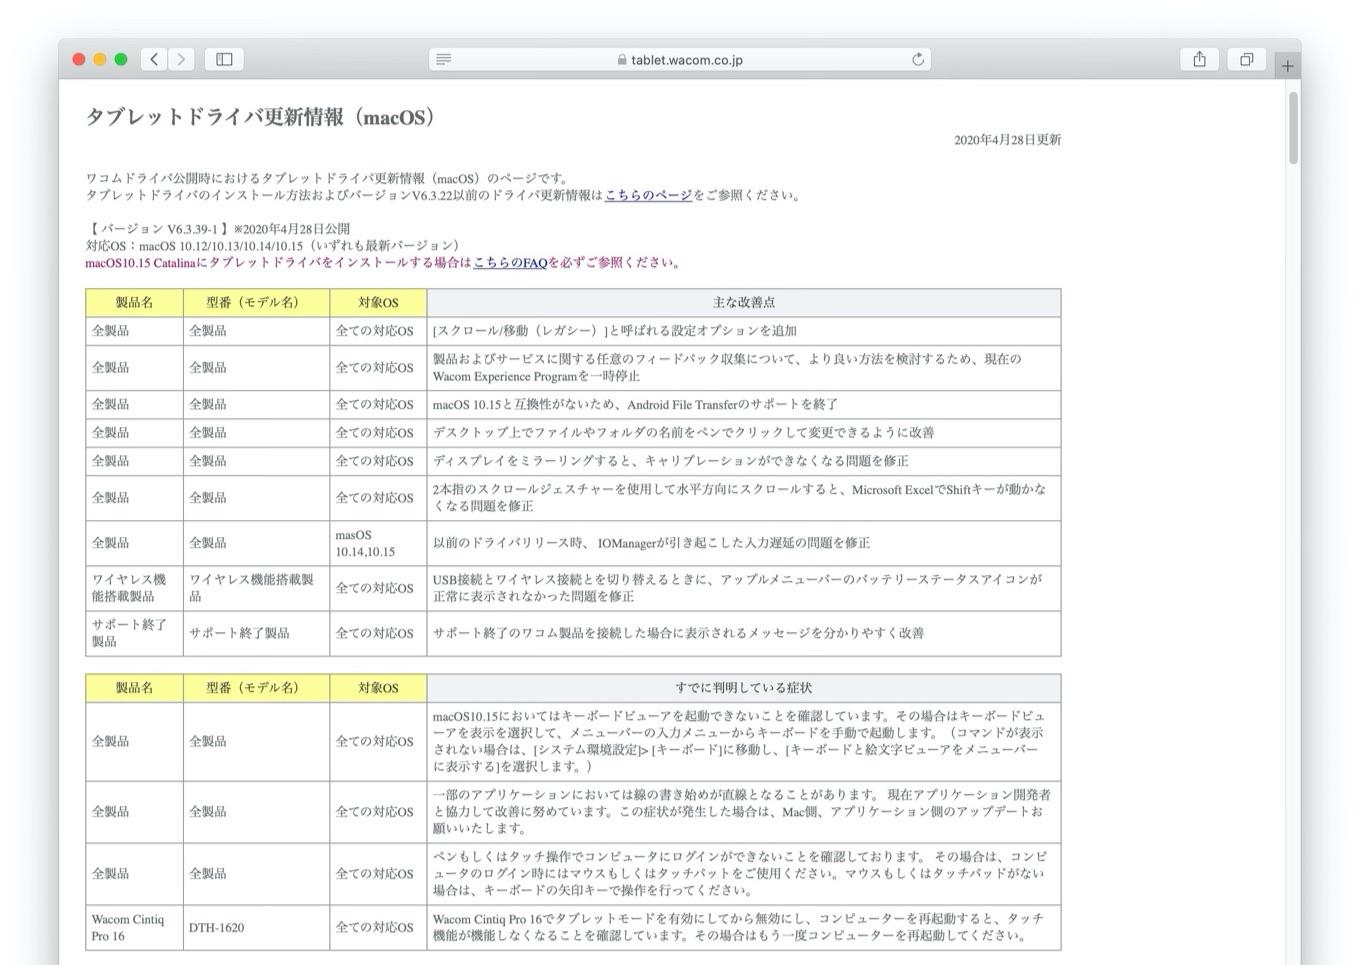 macOS用タブレットドライバ v6.3.39-1のリリースノート